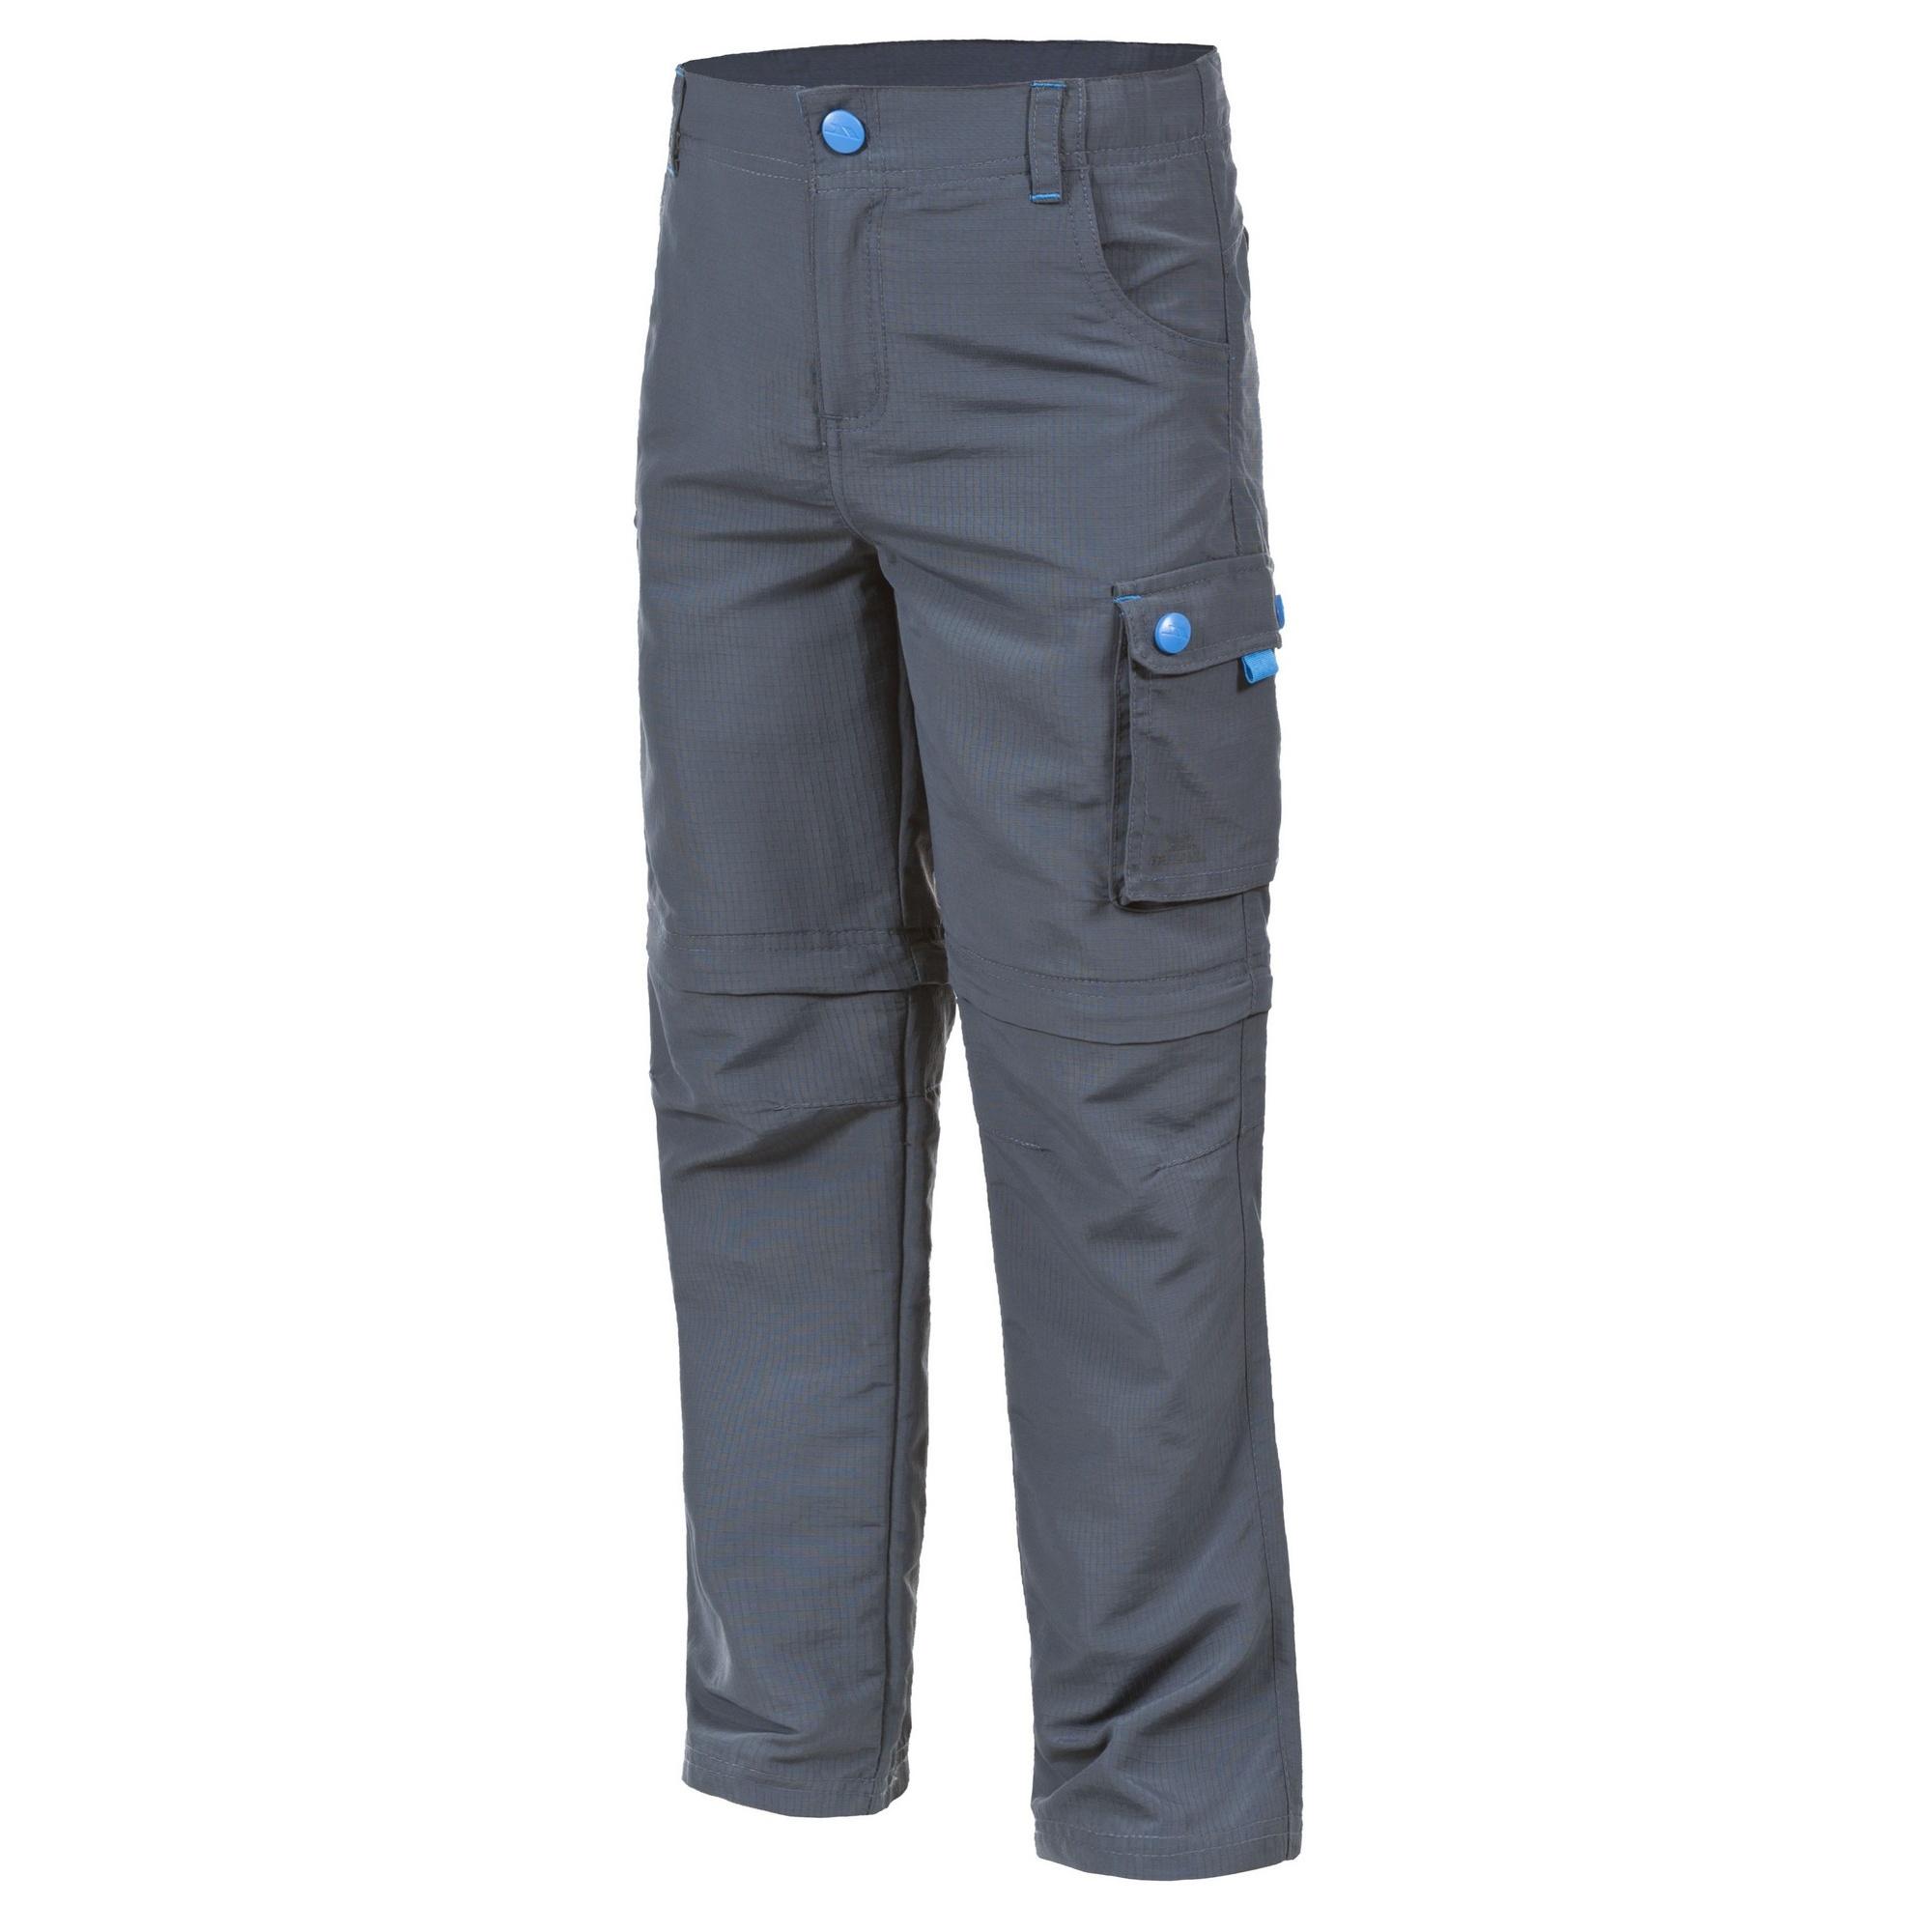 Trespass Childrens//Kids Echo Waterproof Trousers TP450